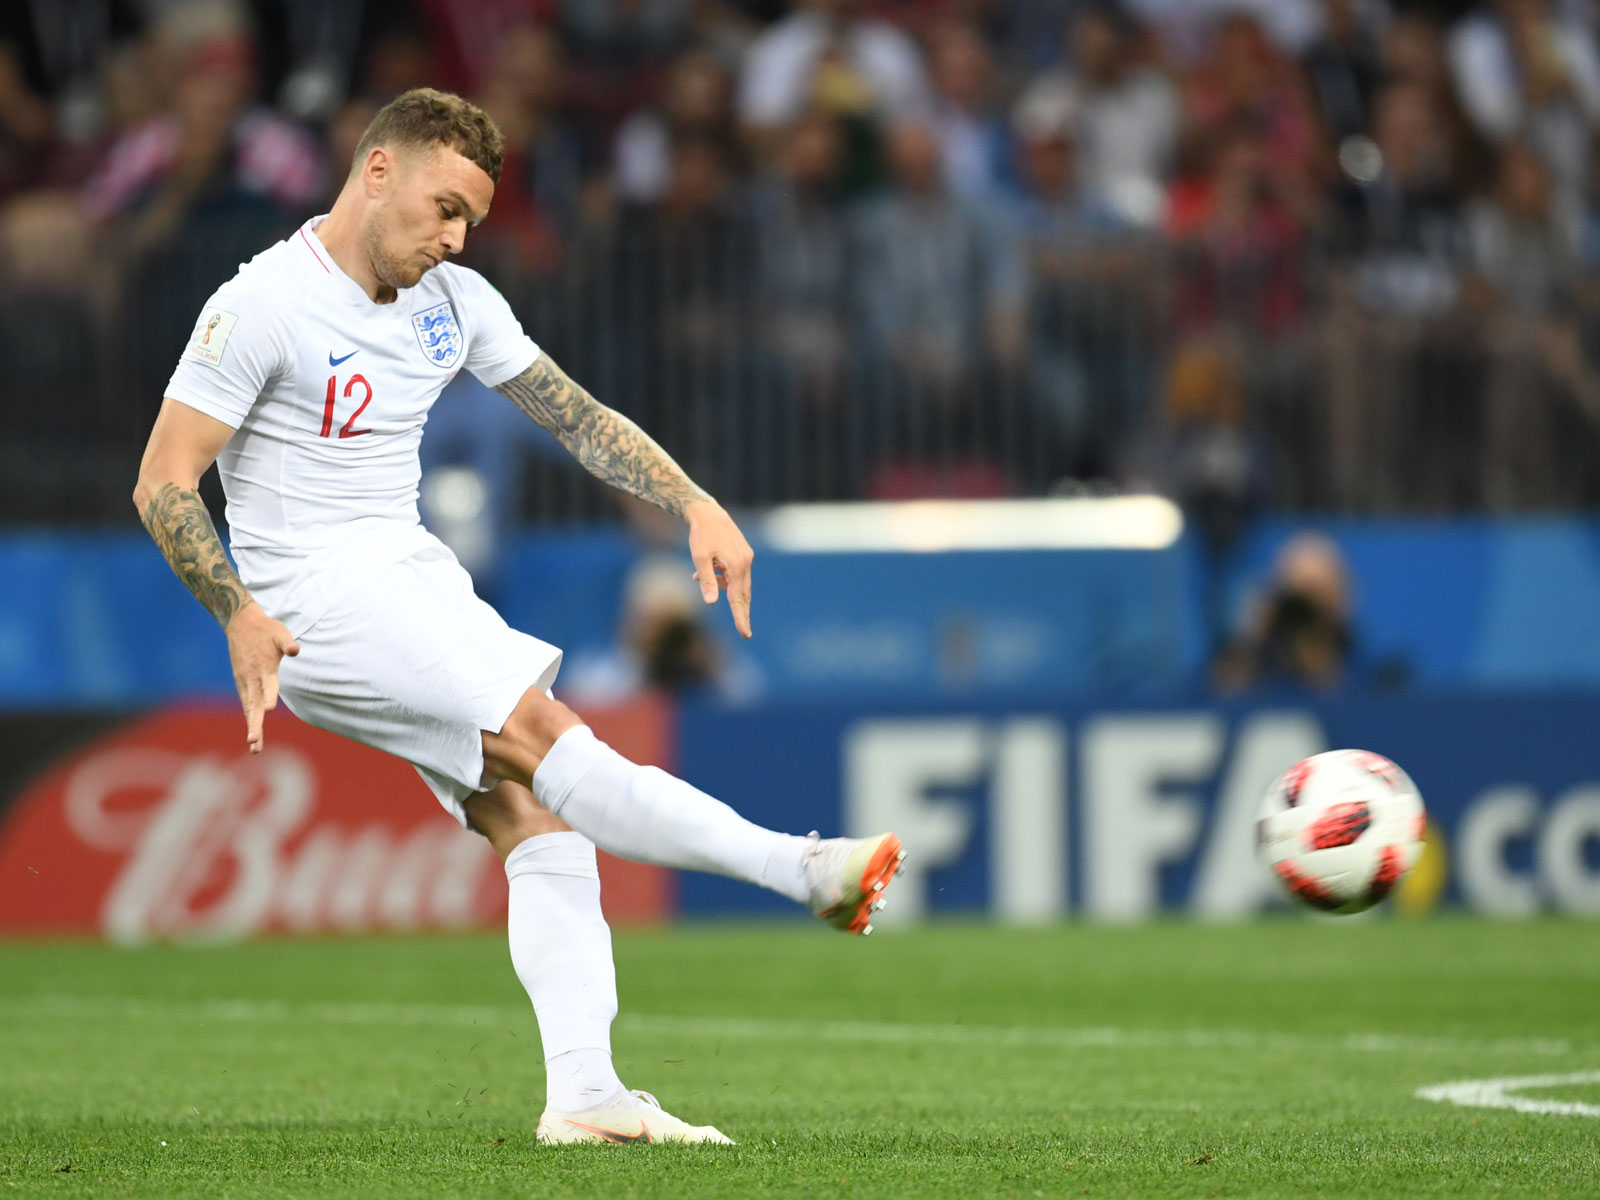 Kieran Trippier scores for England vs. Croatia in the World Cup semifinals